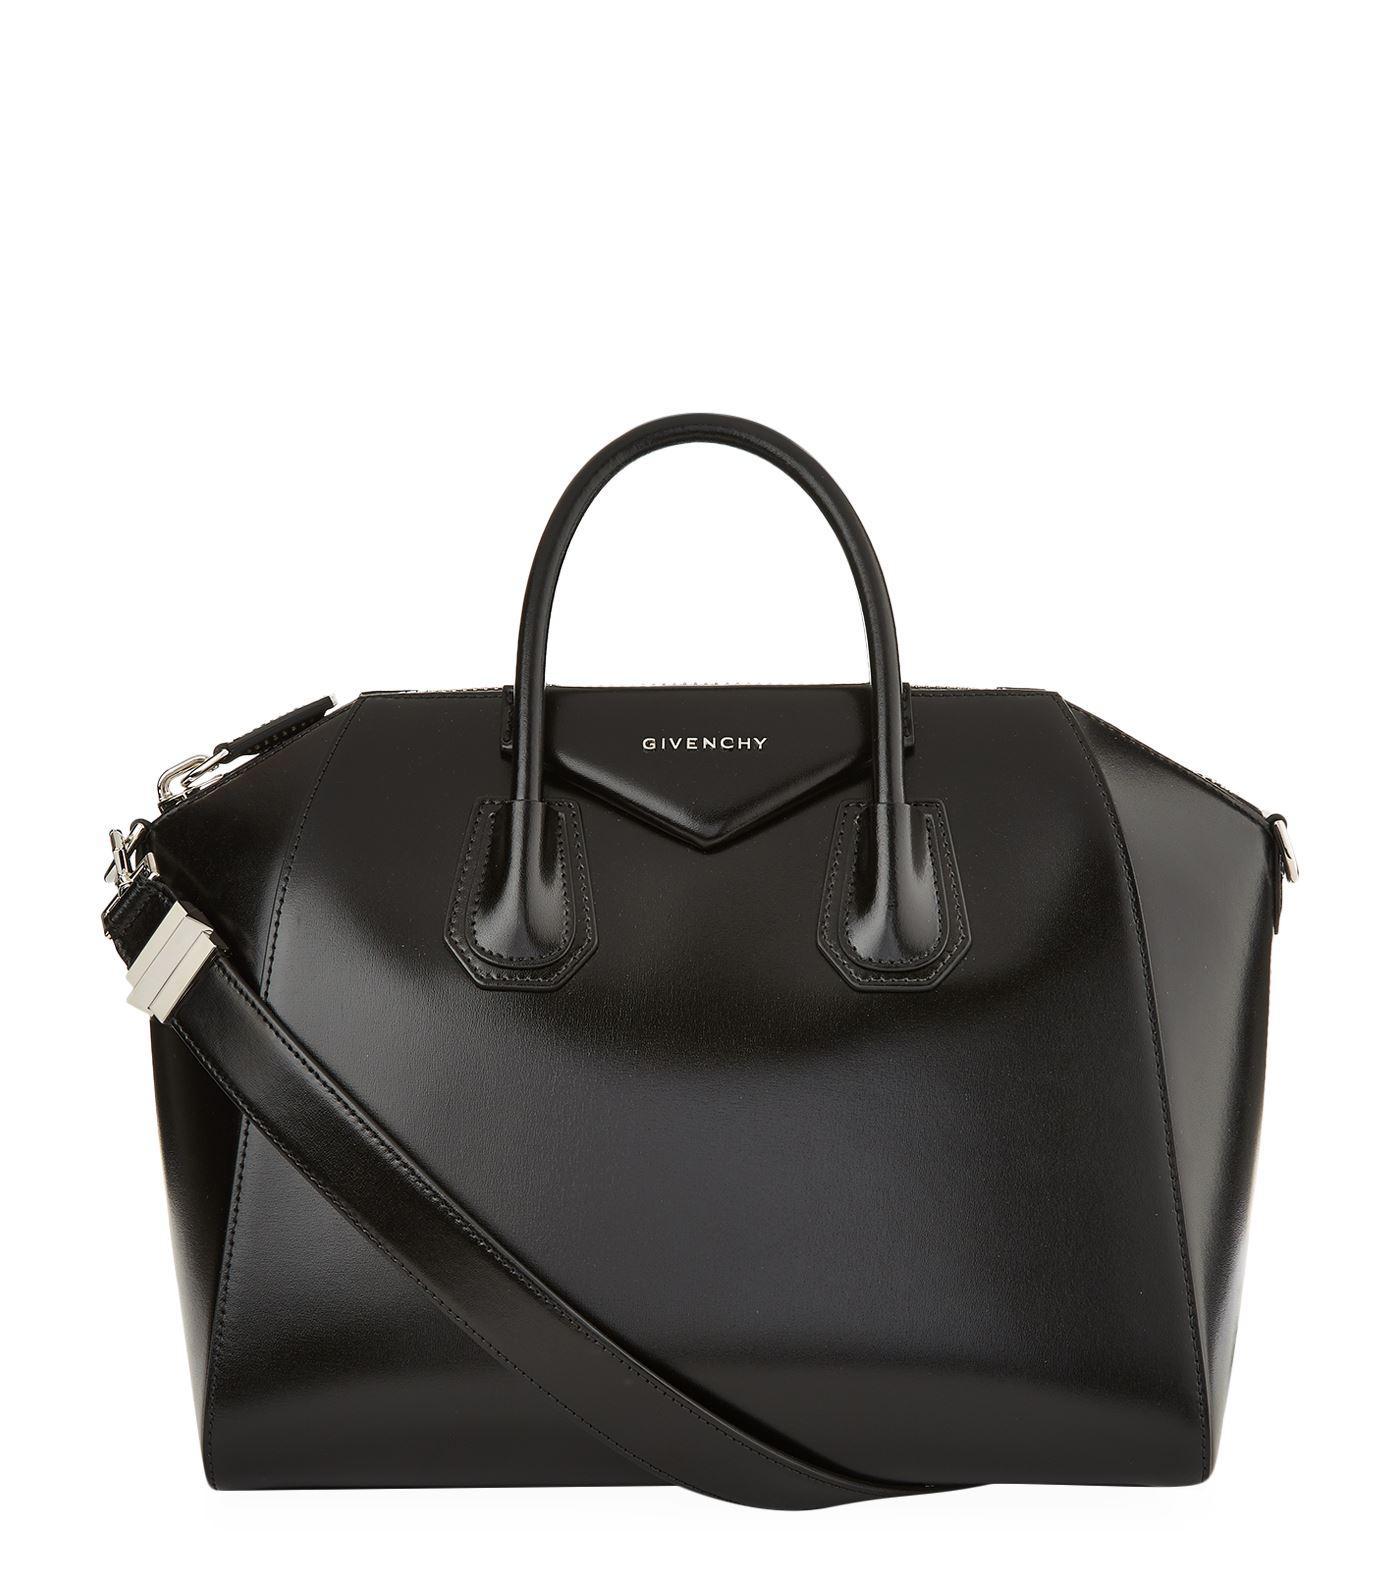 5309eb329396 Givenchy Antigona Small Leather Tote In Black